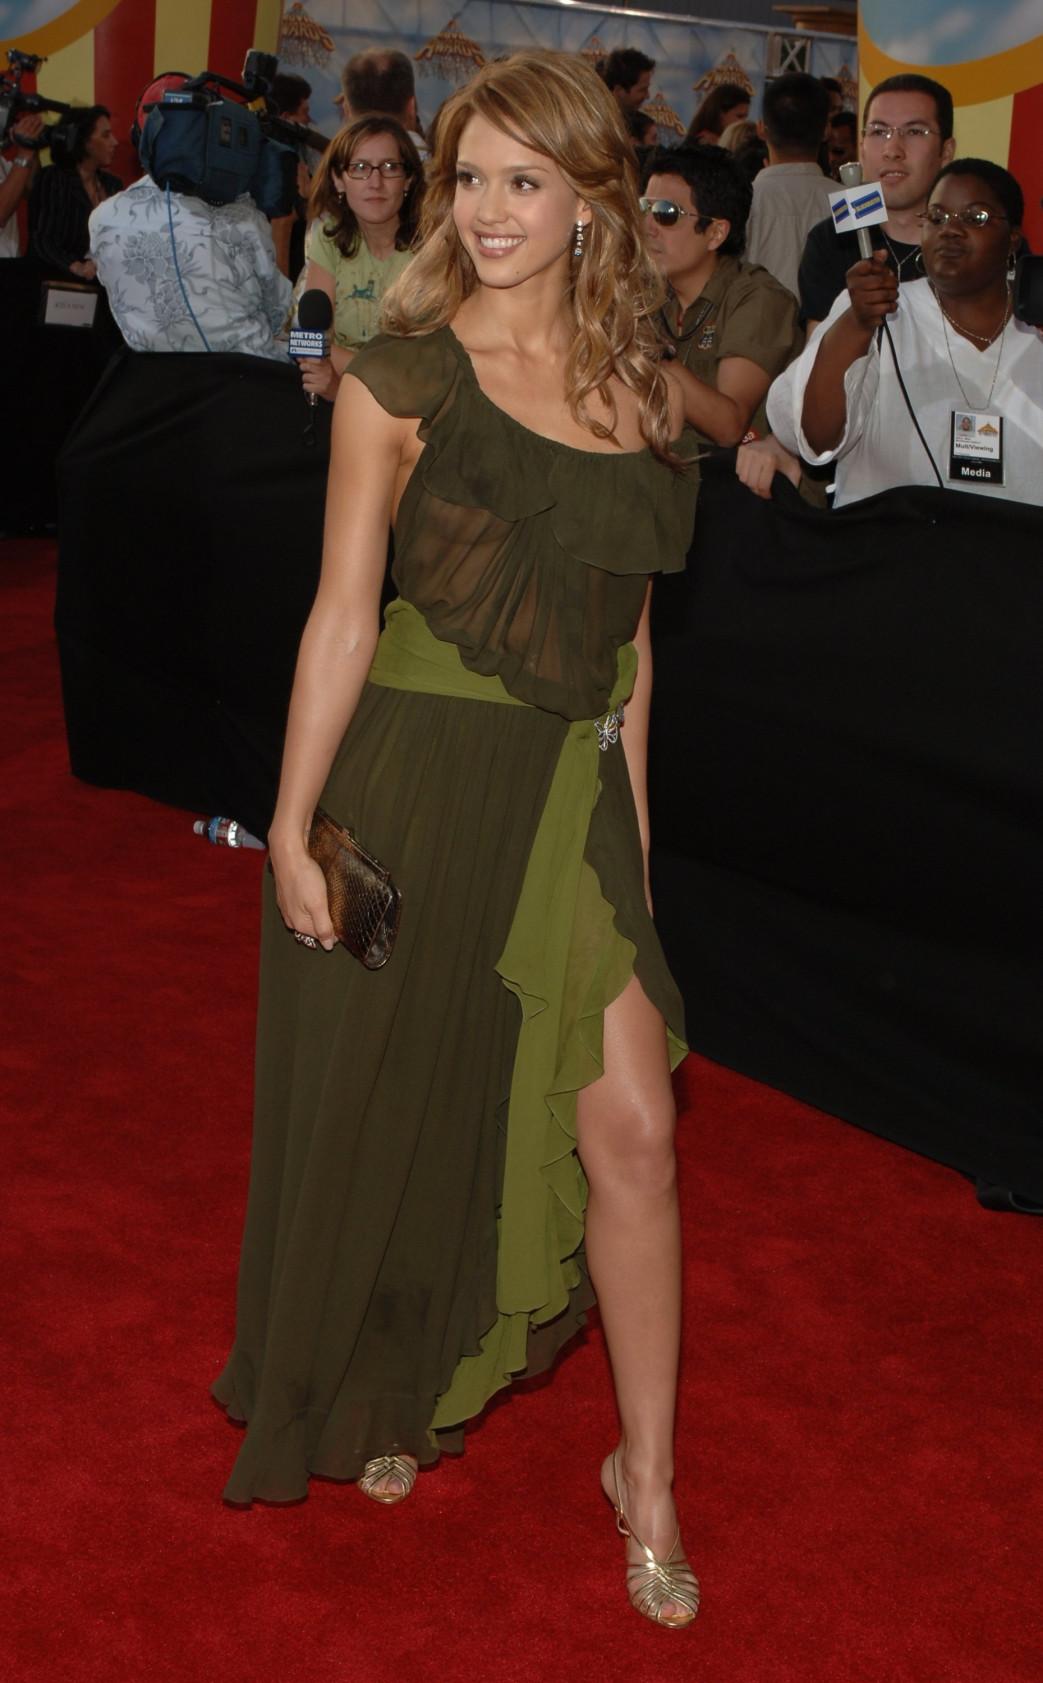 Jessica-Alba-Wardrobe-Malfuction-OOPS-Moments-17.jpg